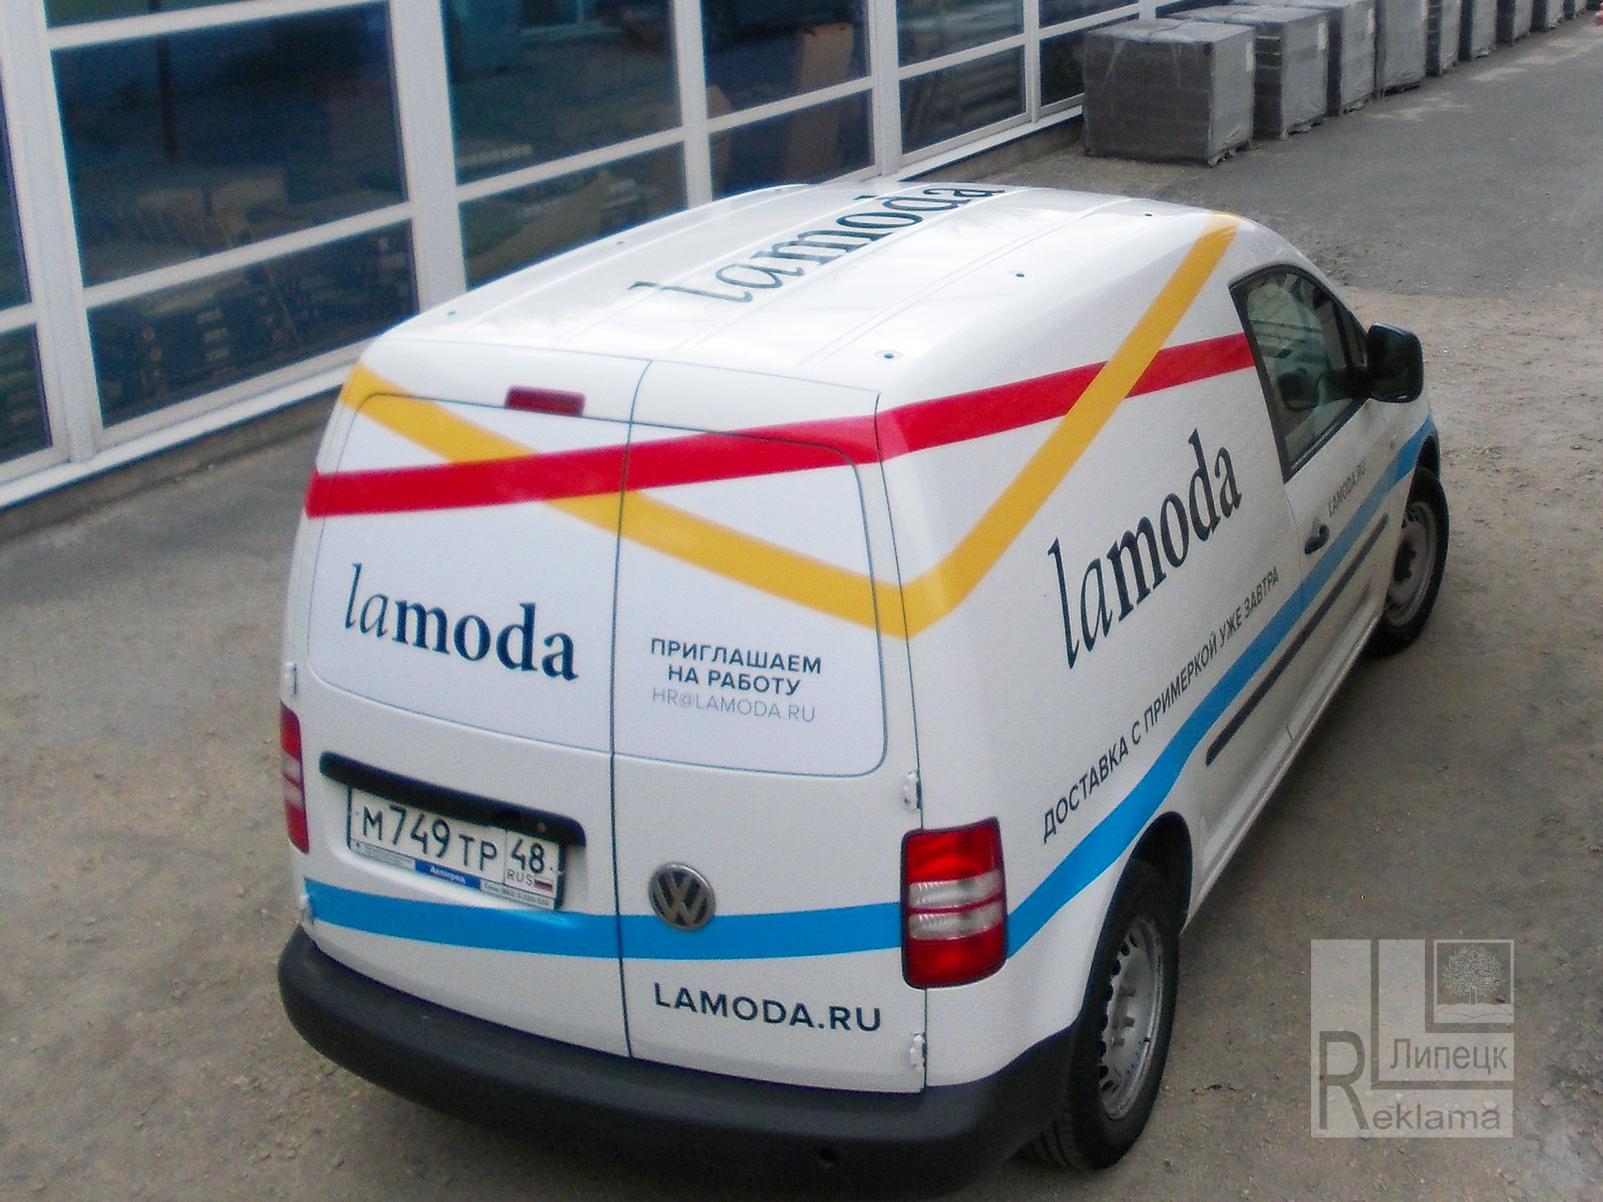 RL_lamoda_5